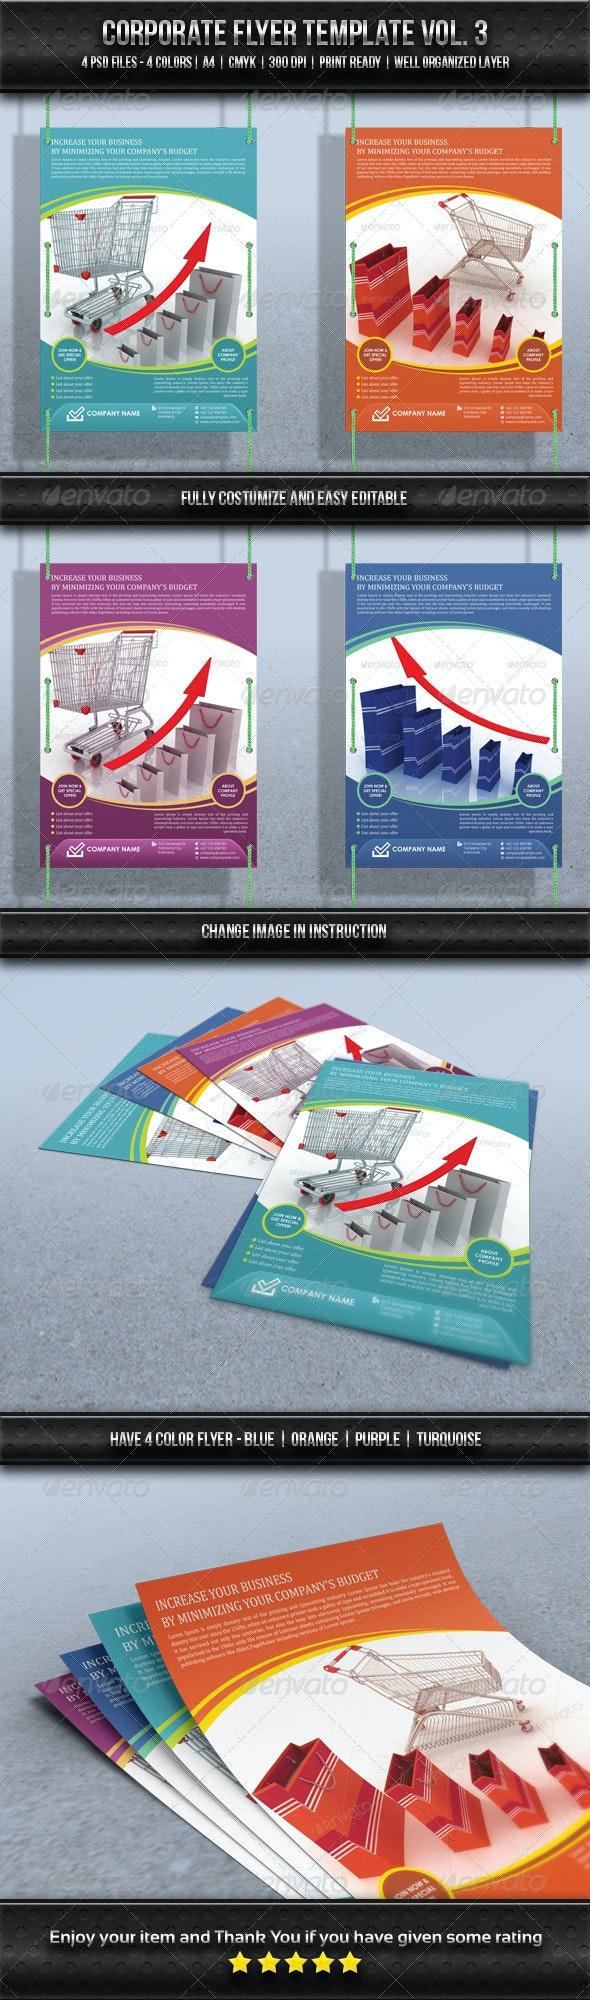 Corporate Flyer Template Vol. 3 - Corporate Flyers